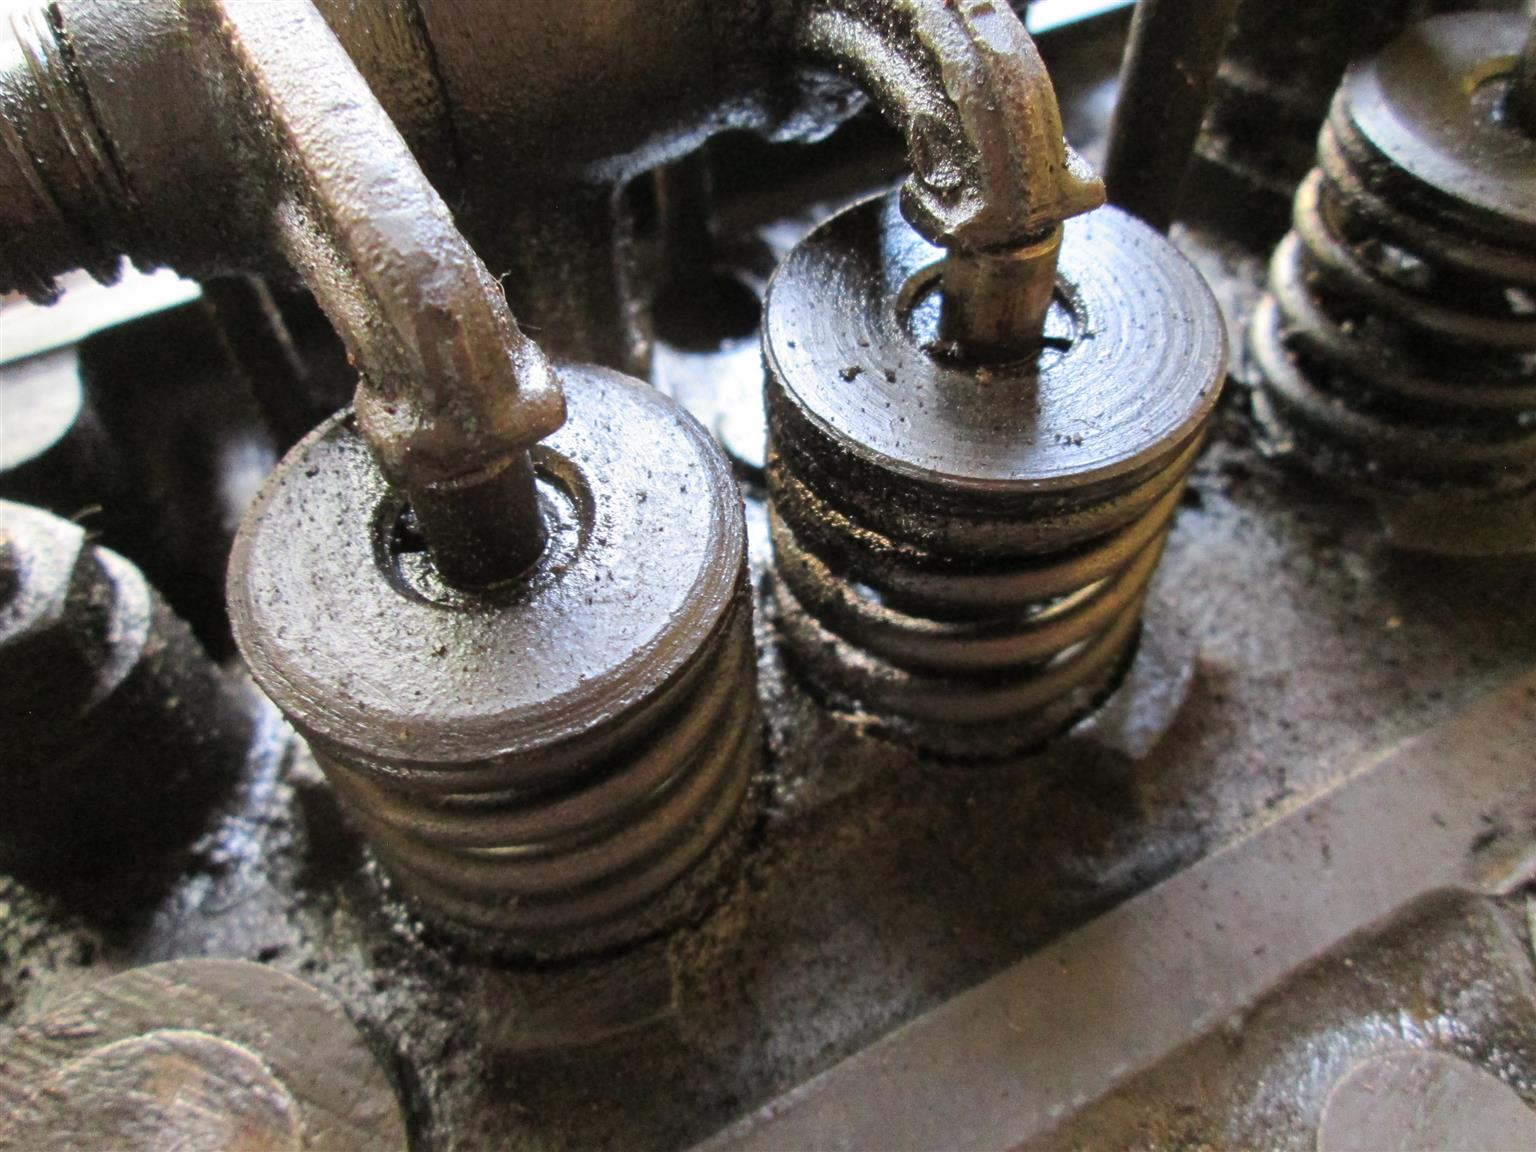 MF Vaaljapie tractor engine (#1), Massey Harris Ferguson, petrol / paraffin, 4-cylinder, TE20